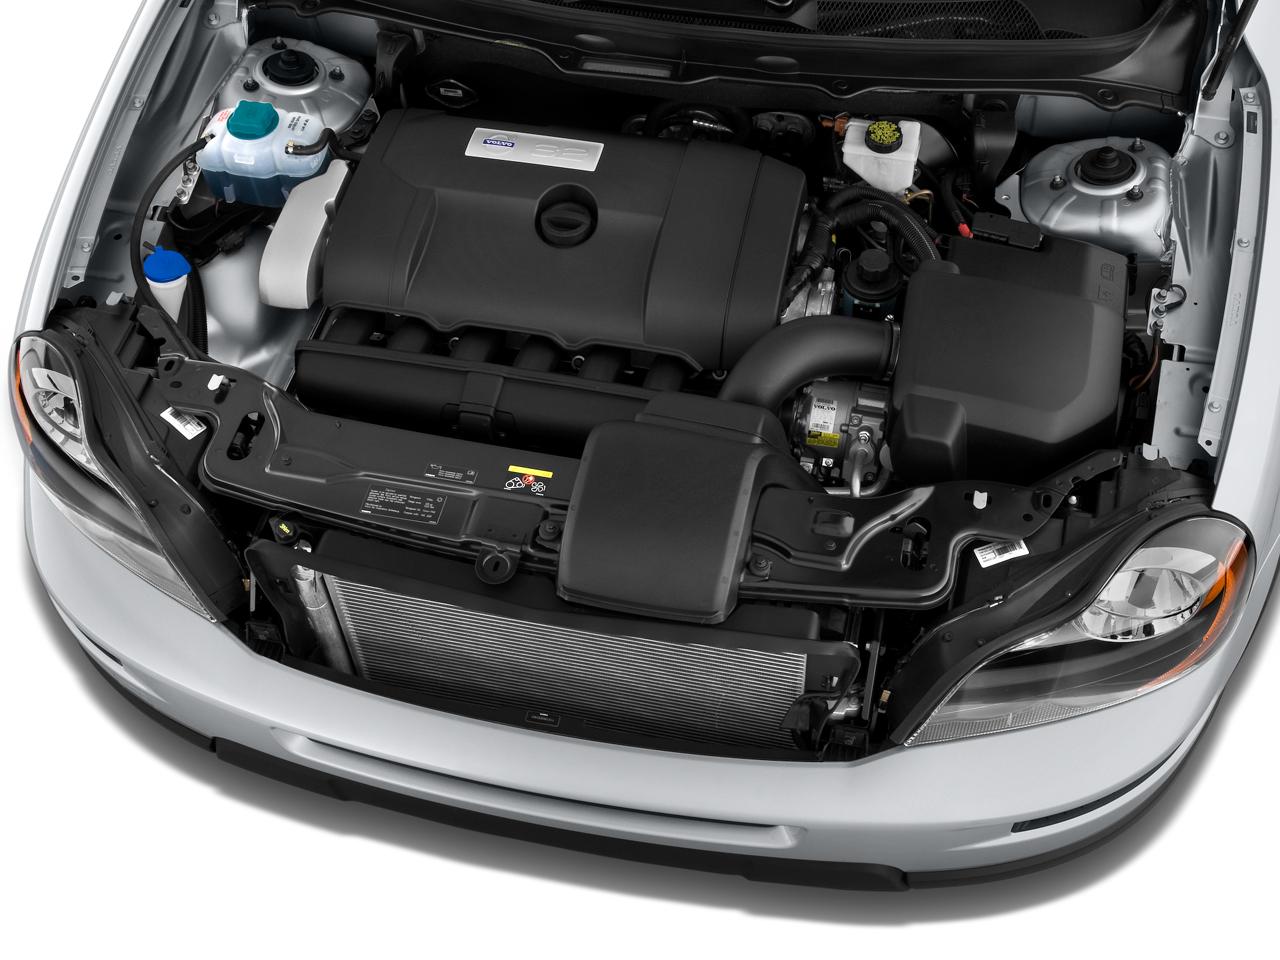 insuring your volvo xc90